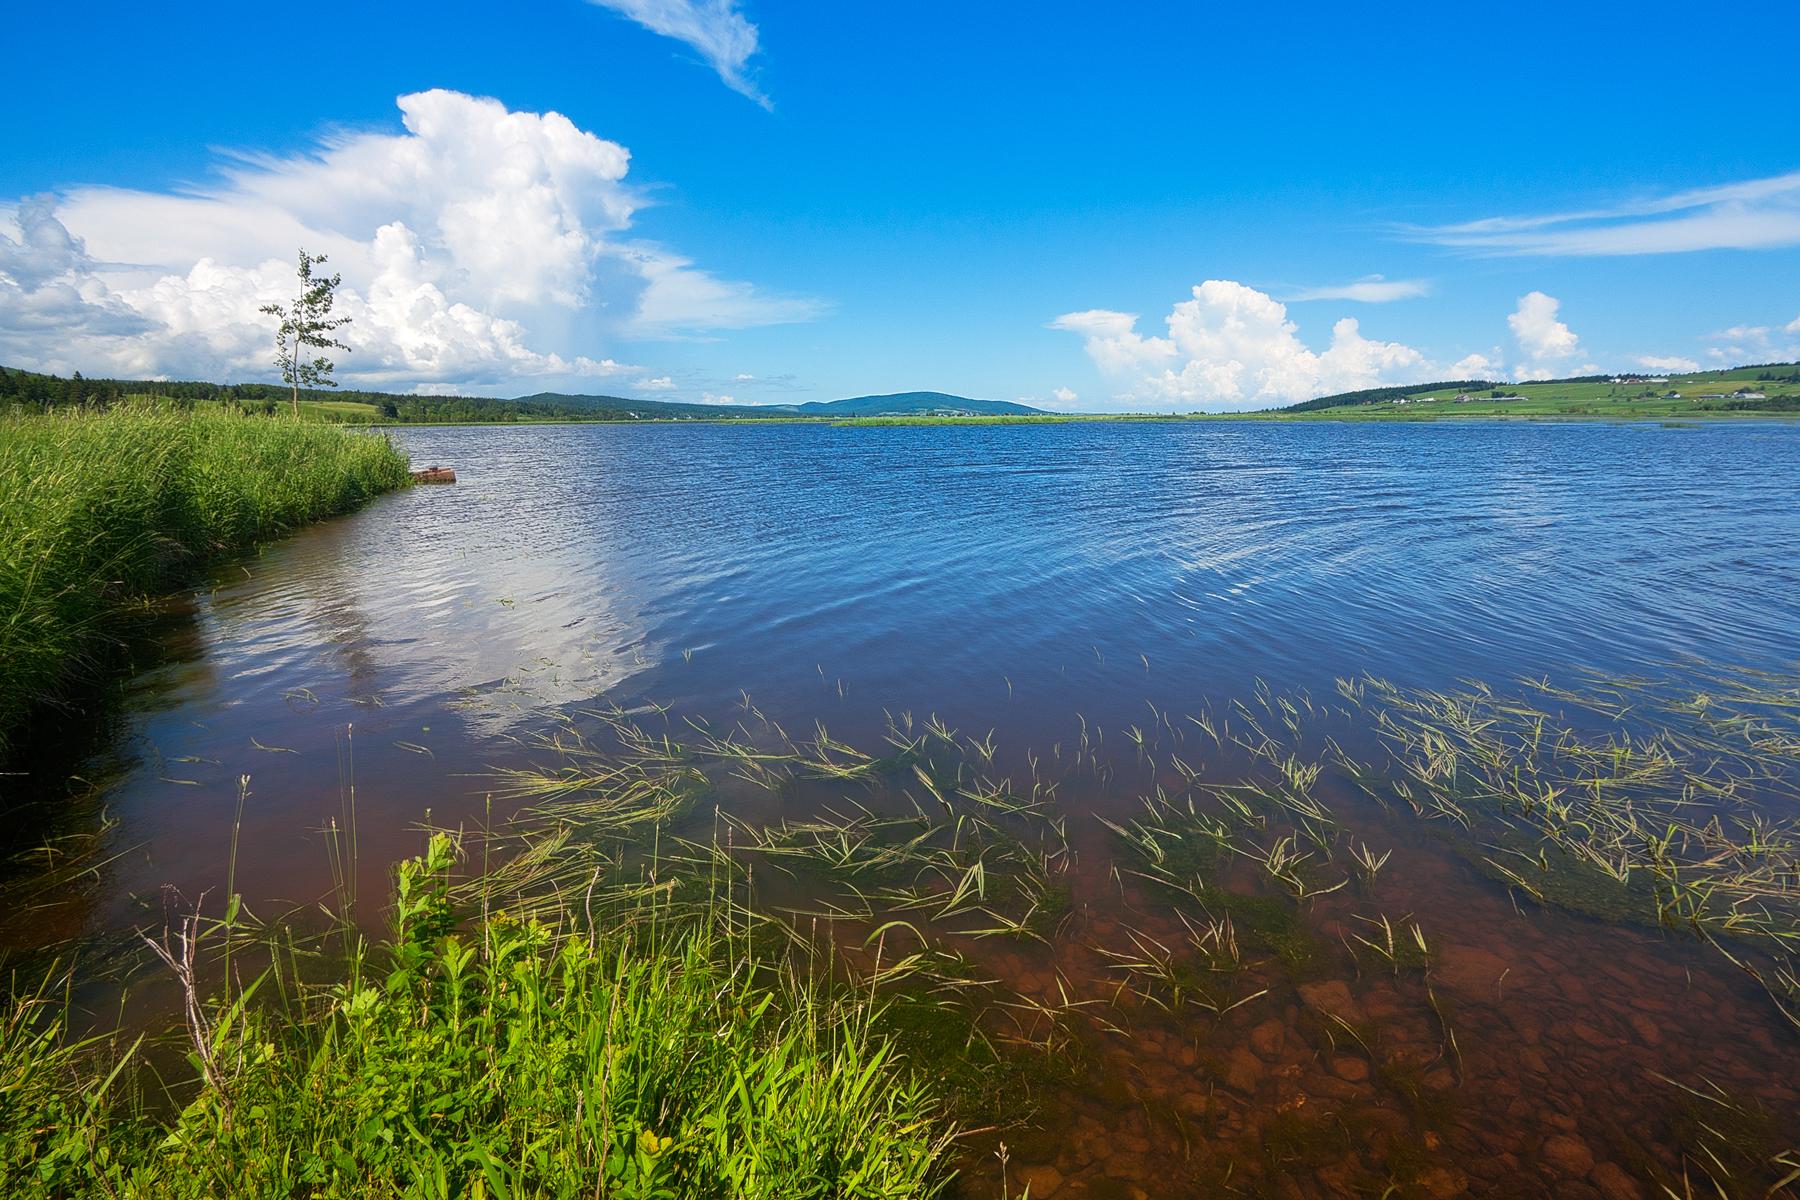 Beaver brook scenery - hdr photo